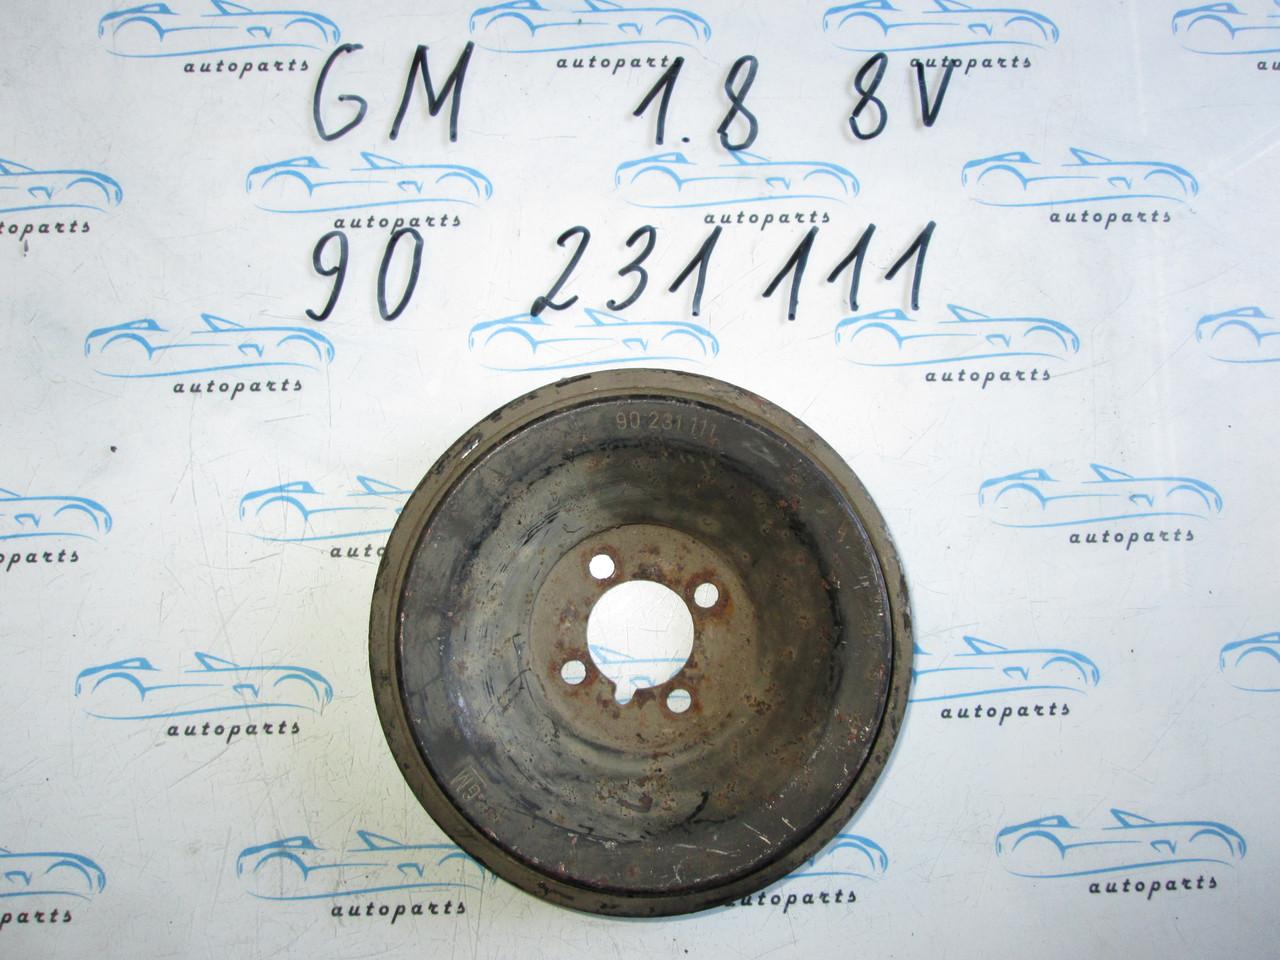 Шкив коленвала Opel 1.8 8V, 90231111